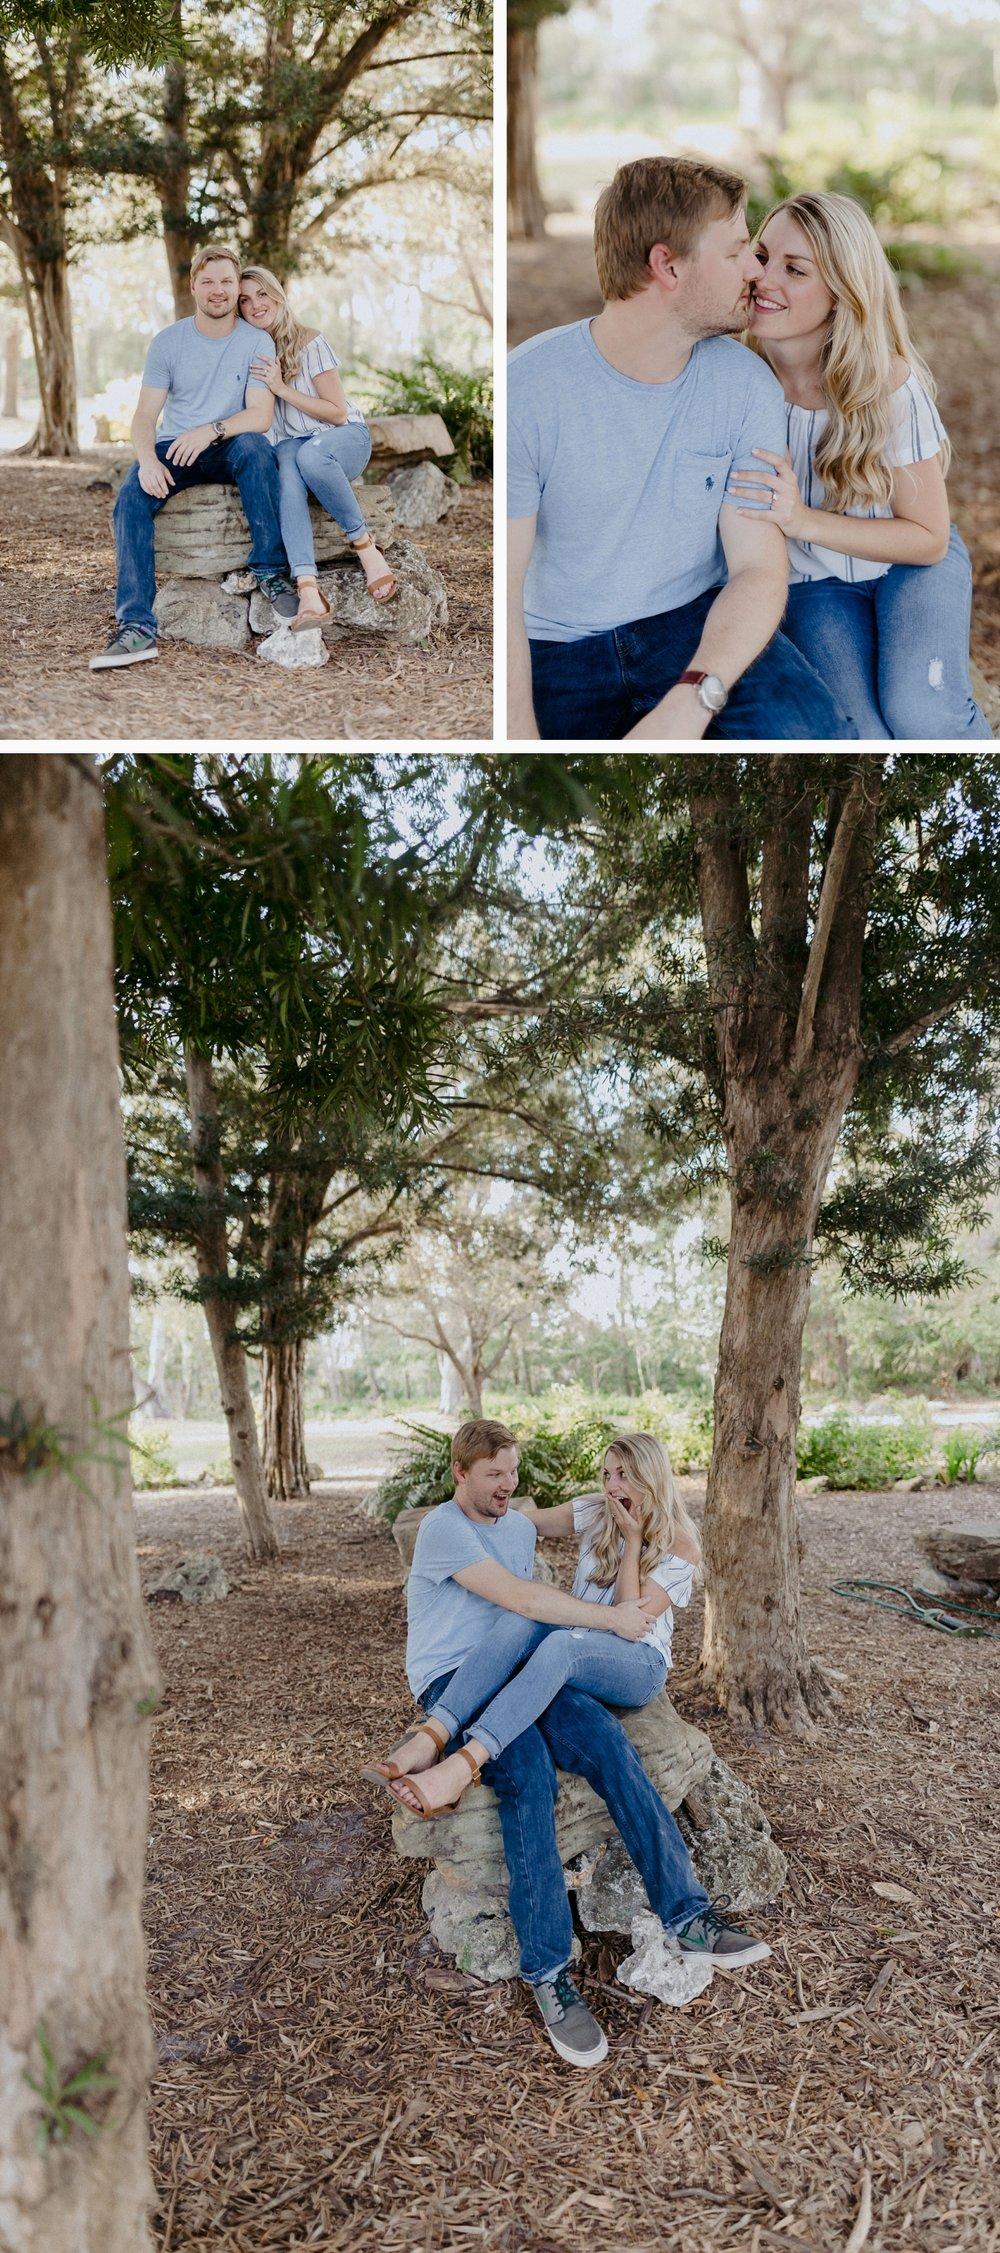 Kylie-And-Jack-Mead-Botanical-Garden-Engagement_0027.jpg